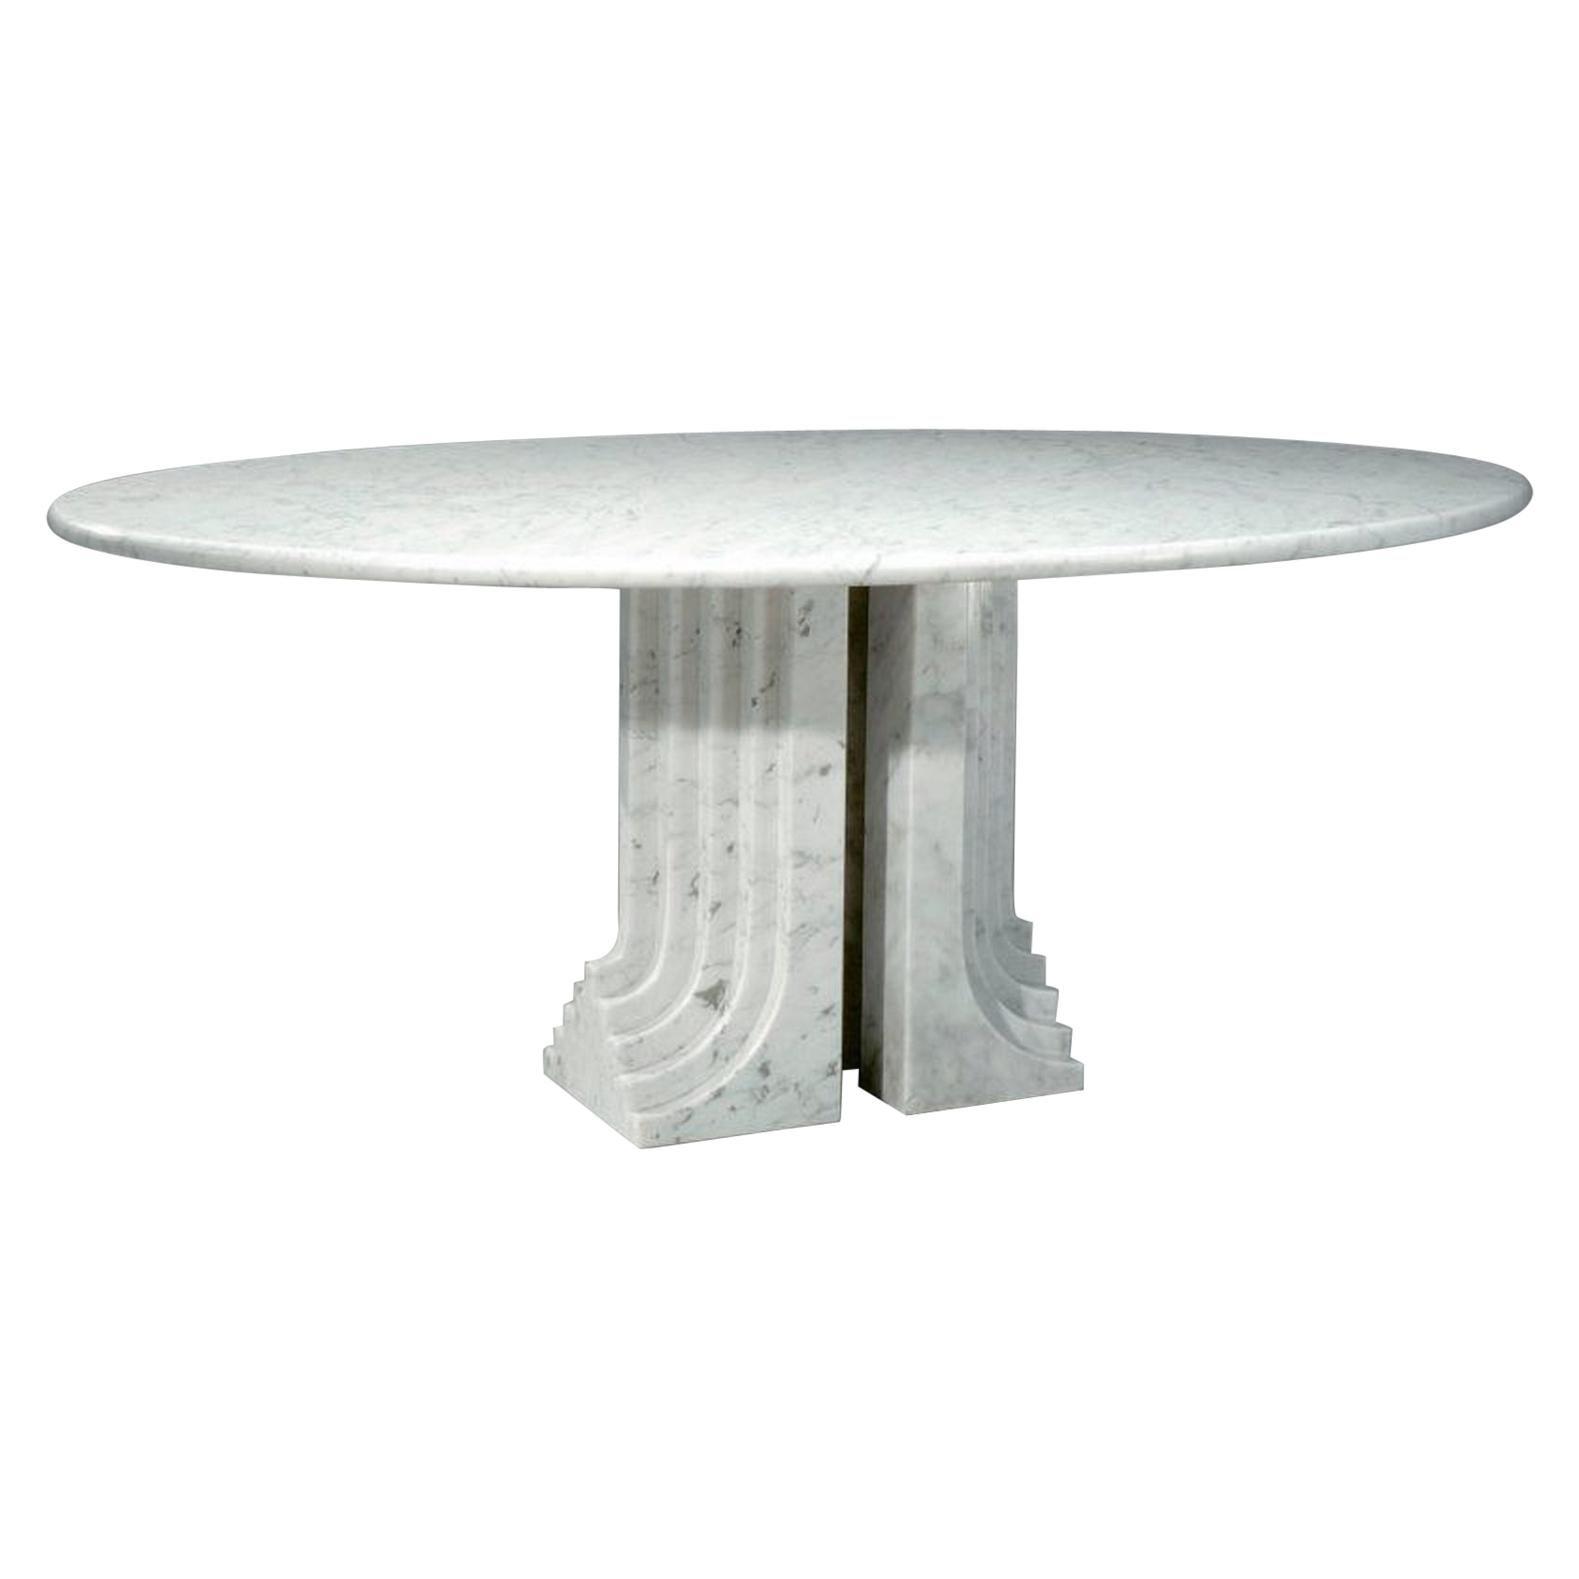 """Samo"" Dining Table by Carlo Scarpa, Italy, 1970"